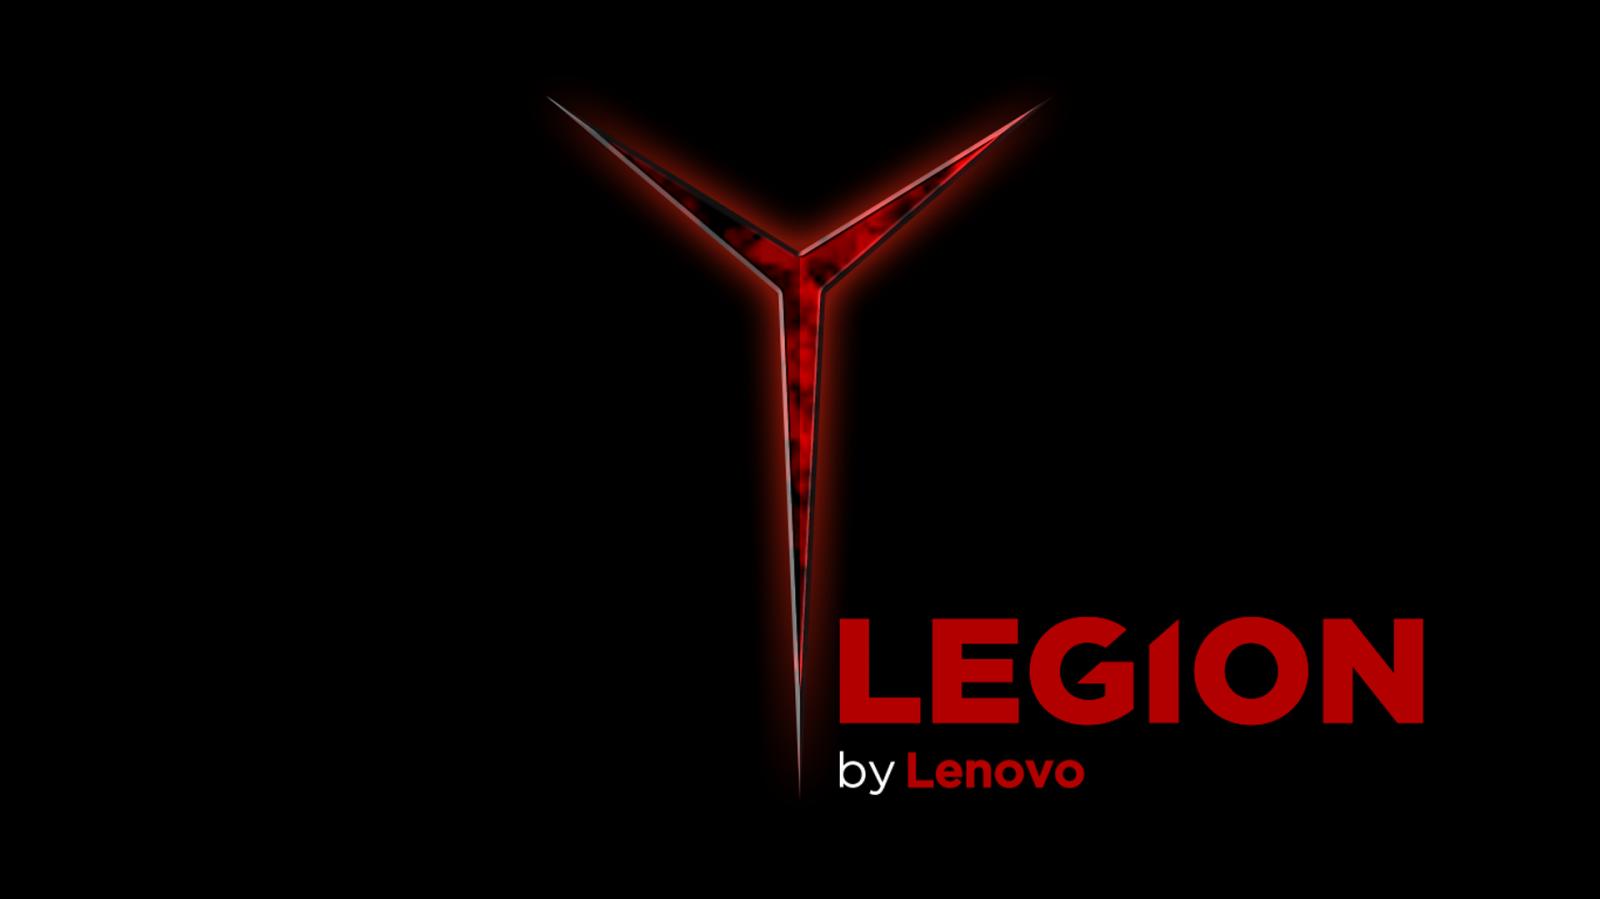 Wallpaper : Lenovo, Legion, Lenovo Legion, PC Gaming